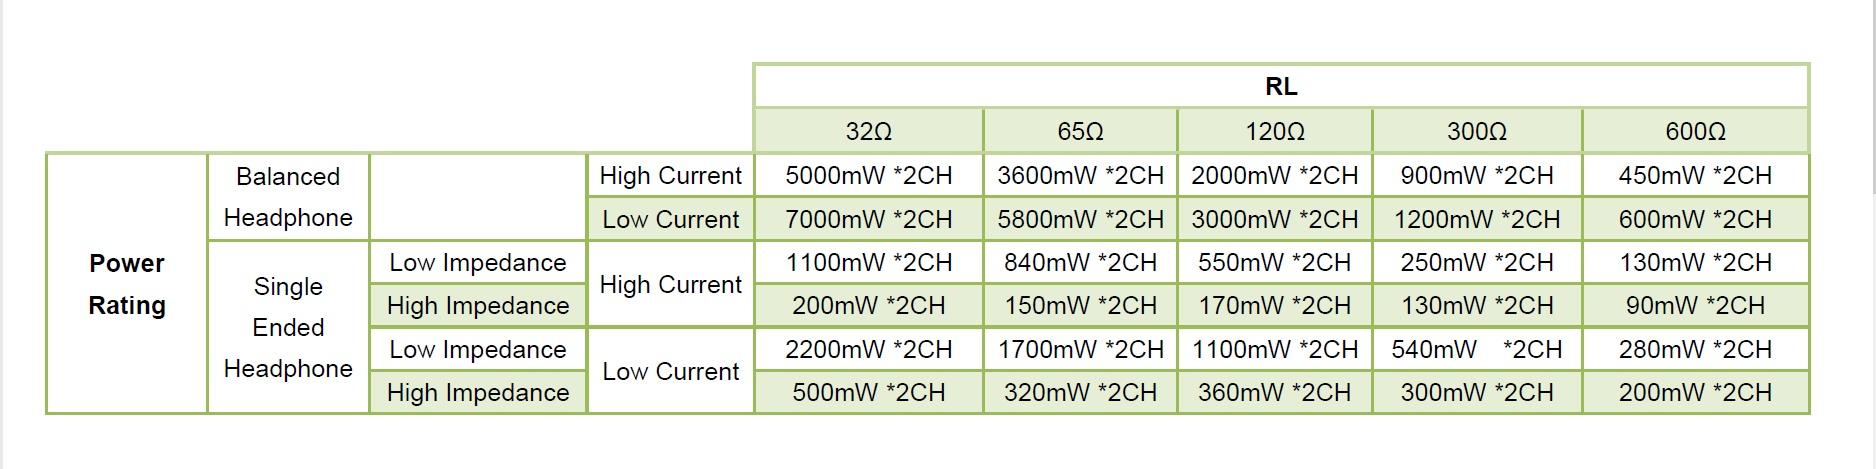 iHA-6 Power Rating.jpg